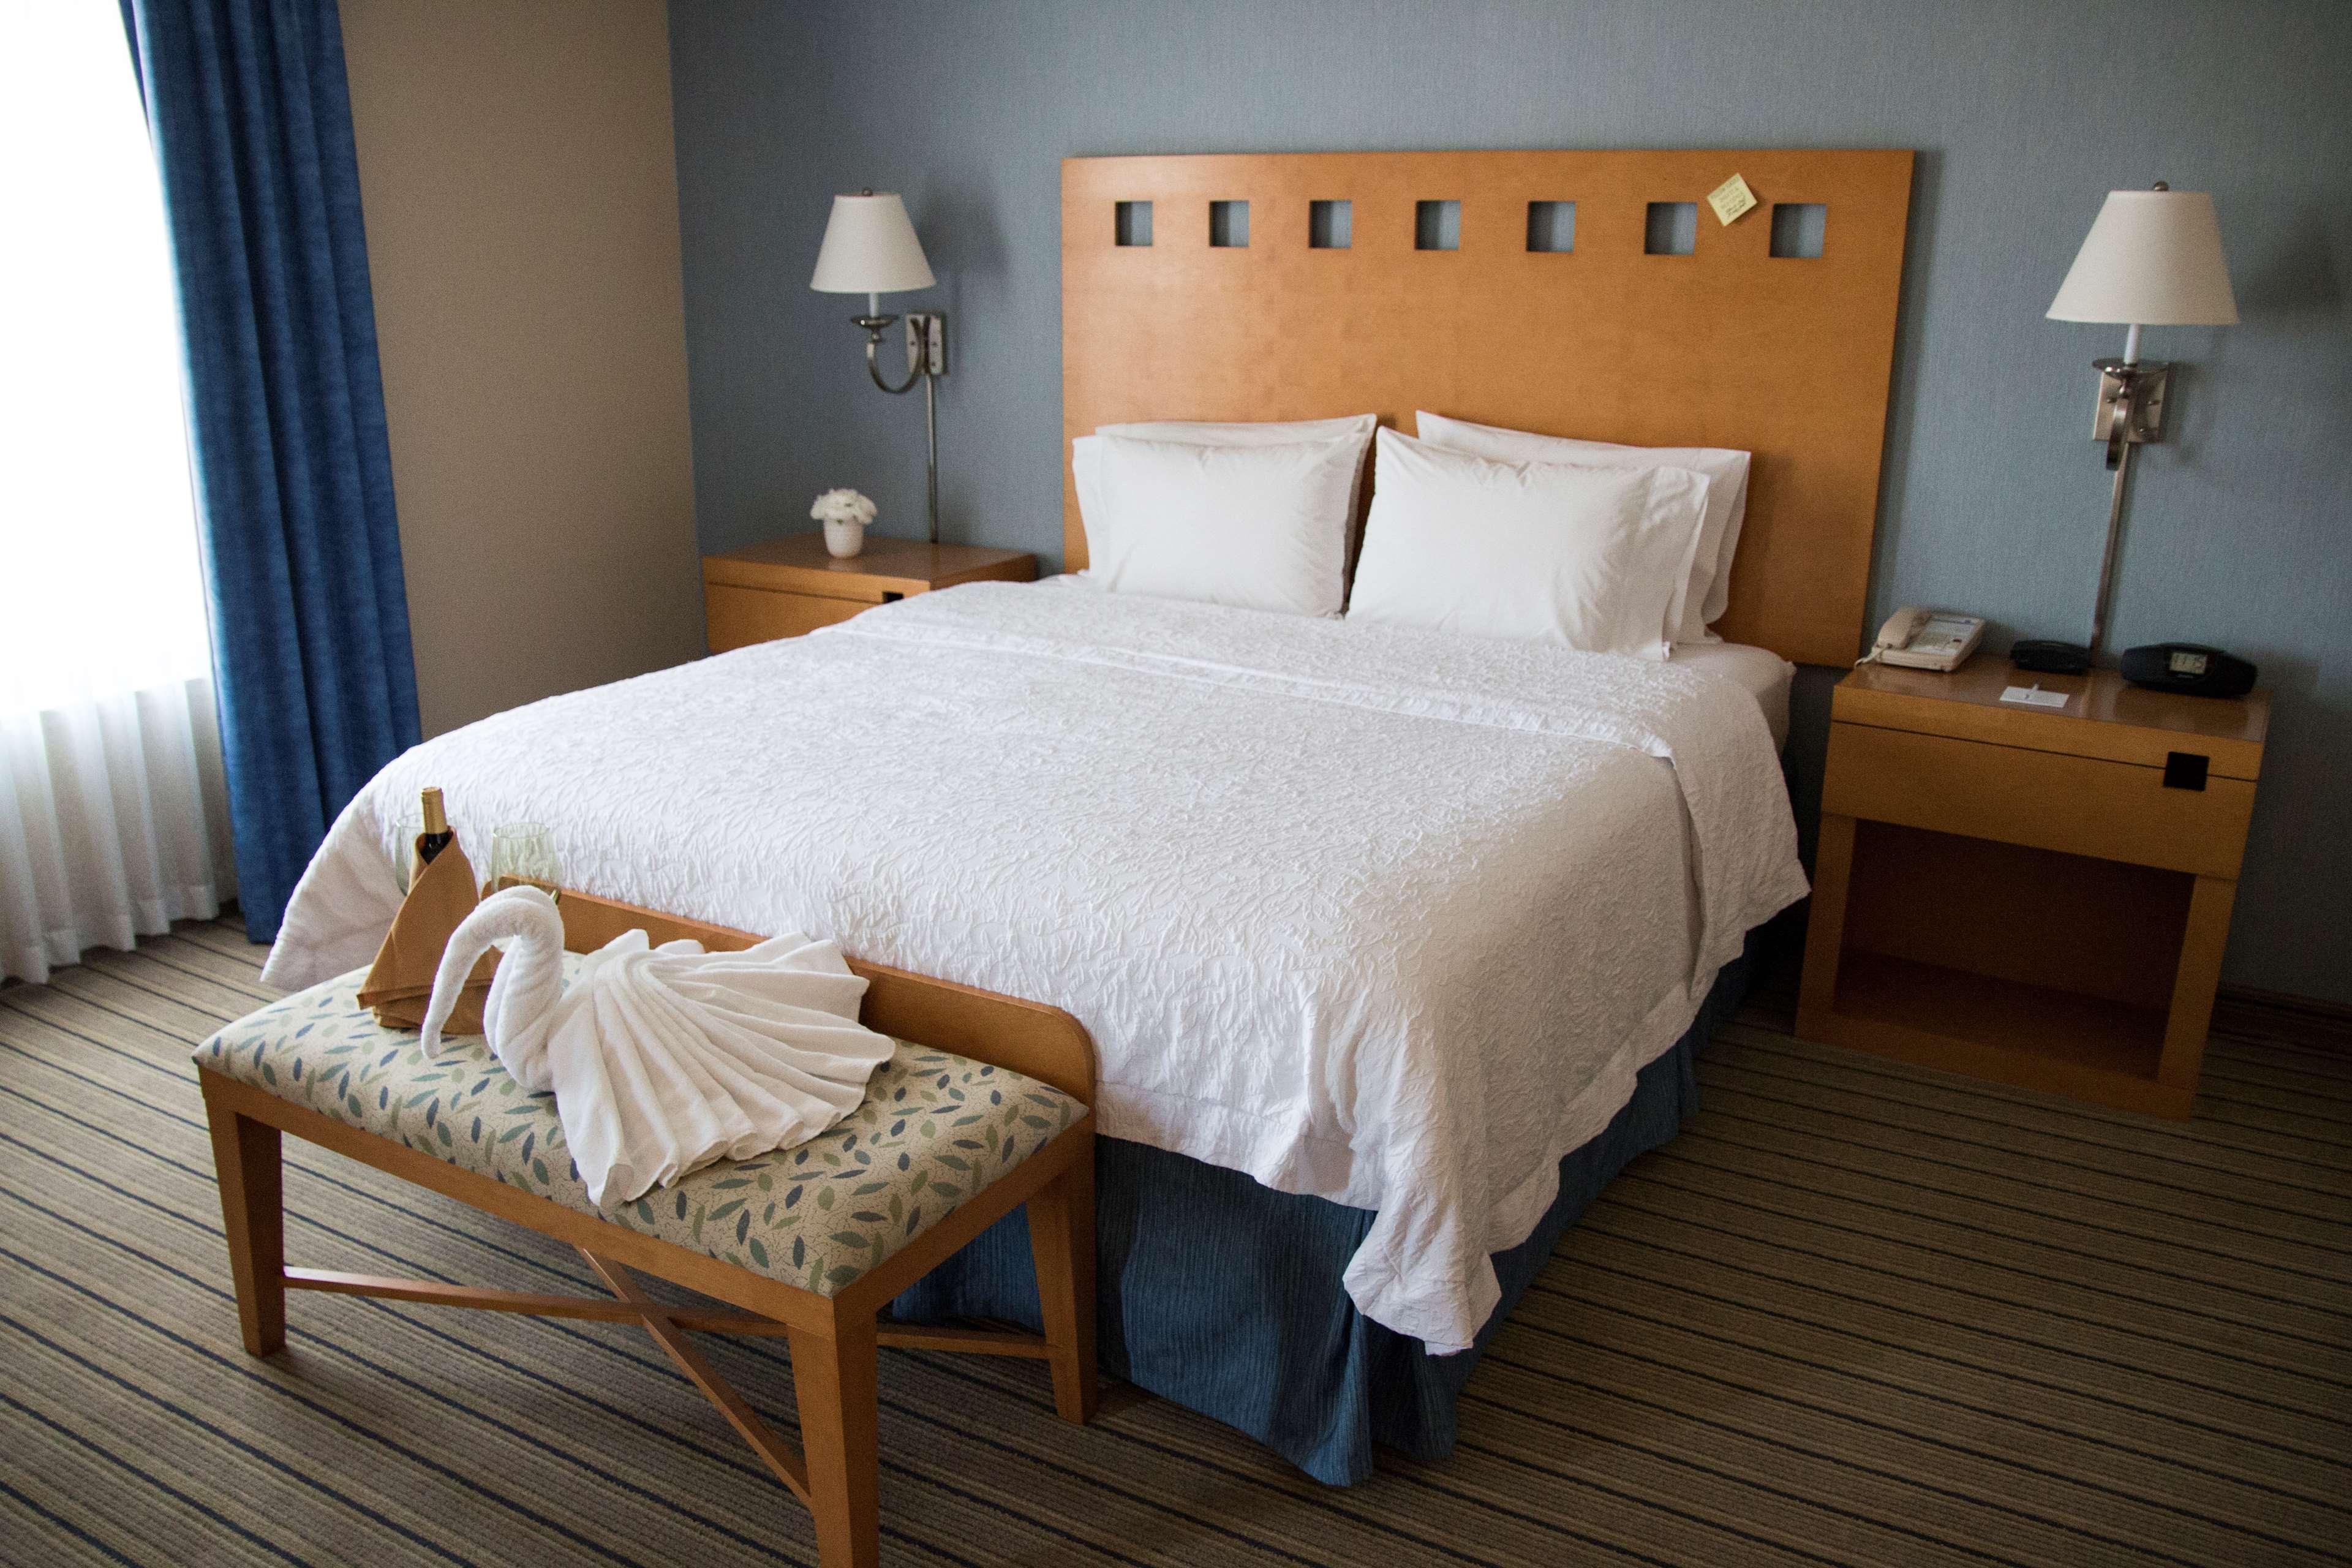 Hampton Inn & Suites Madera image 13